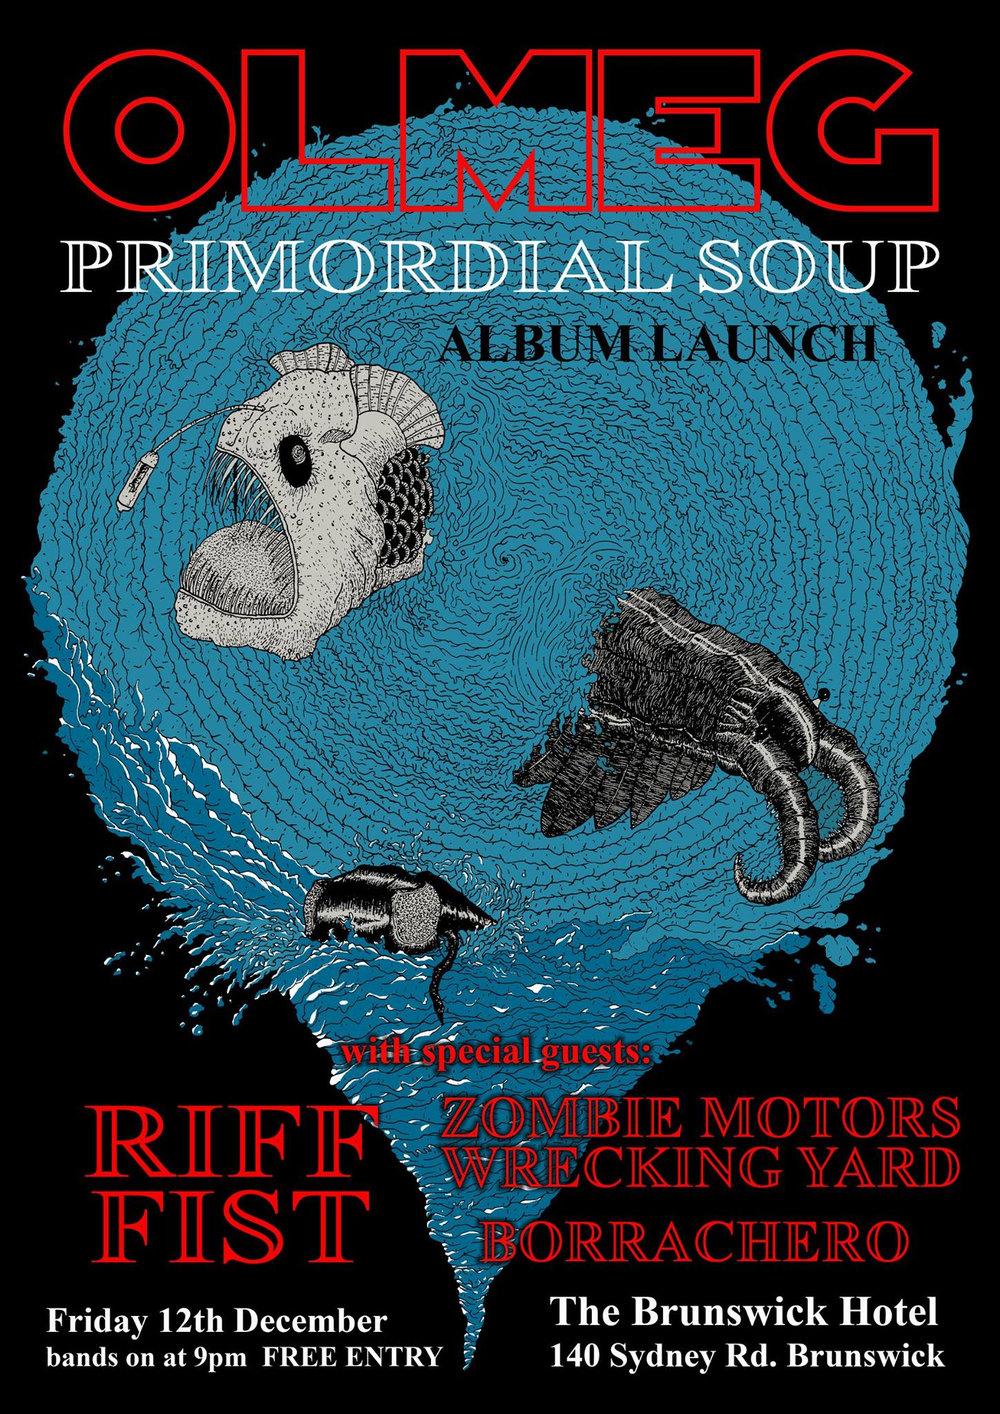 Primordial Soup 12th December.jpg